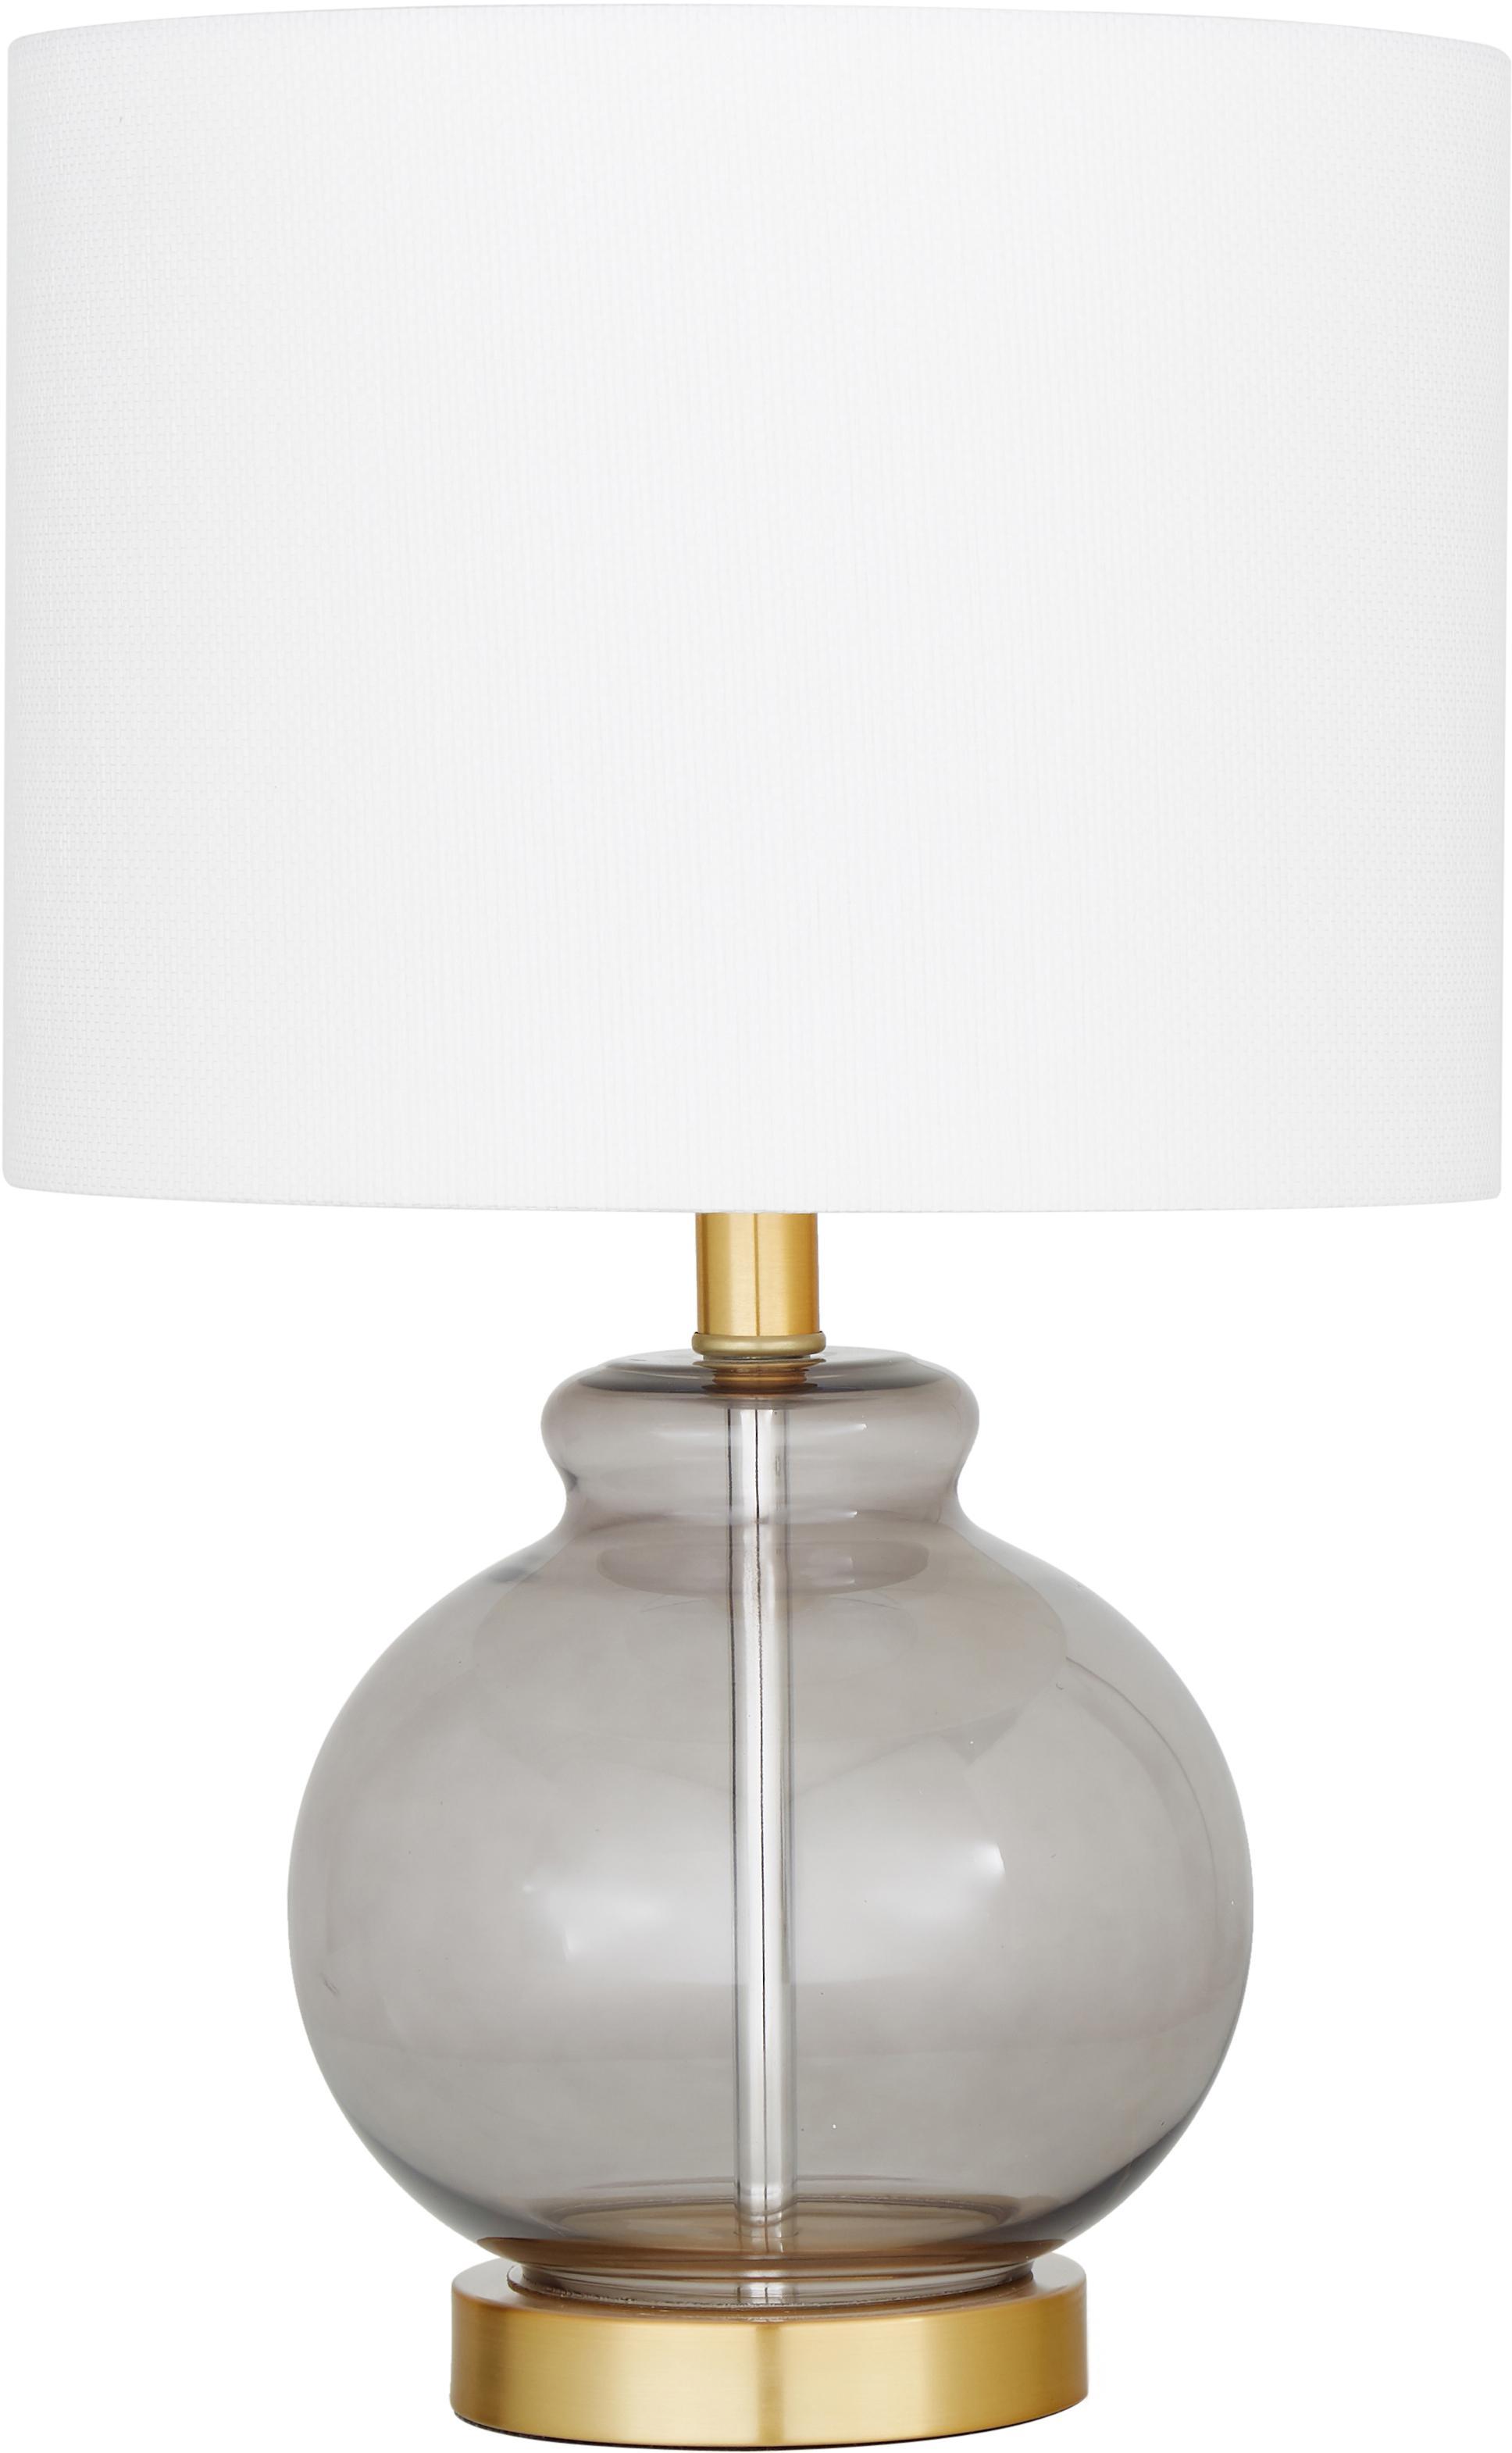 Tafellamp Natty, Lampenkap: textiel, Lampvoet: glas, Geborsteld messing, Wit, blauwgrijs, transparant, Ø 31 x H 48 cm